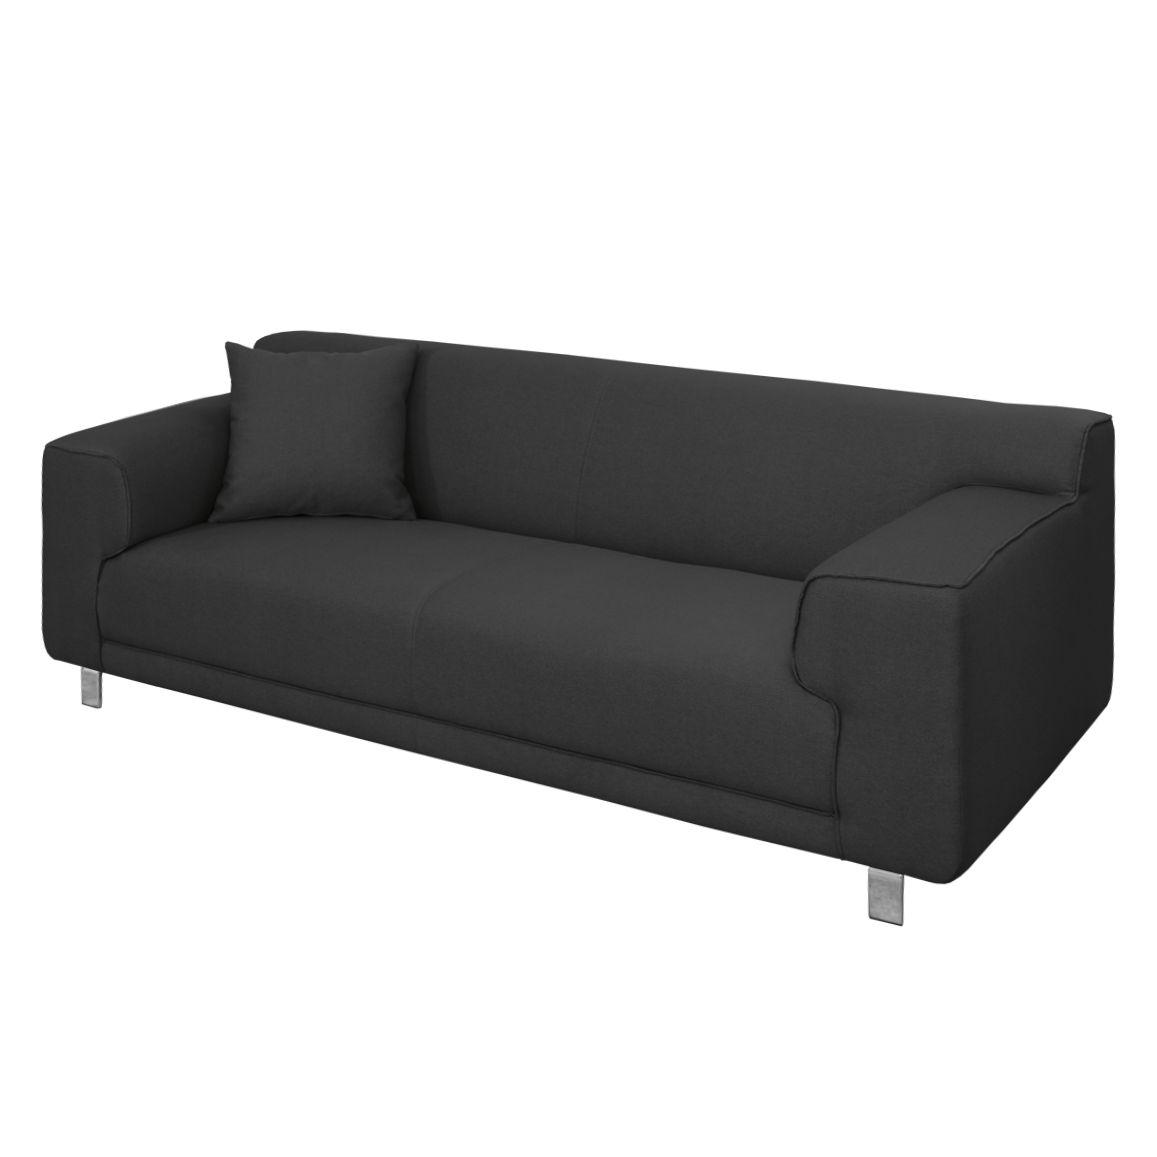 sofa zaran 3 sitzer webstoff schwarz nuovoform. Black Bedroom Furniture Sets. Home Design Ideas